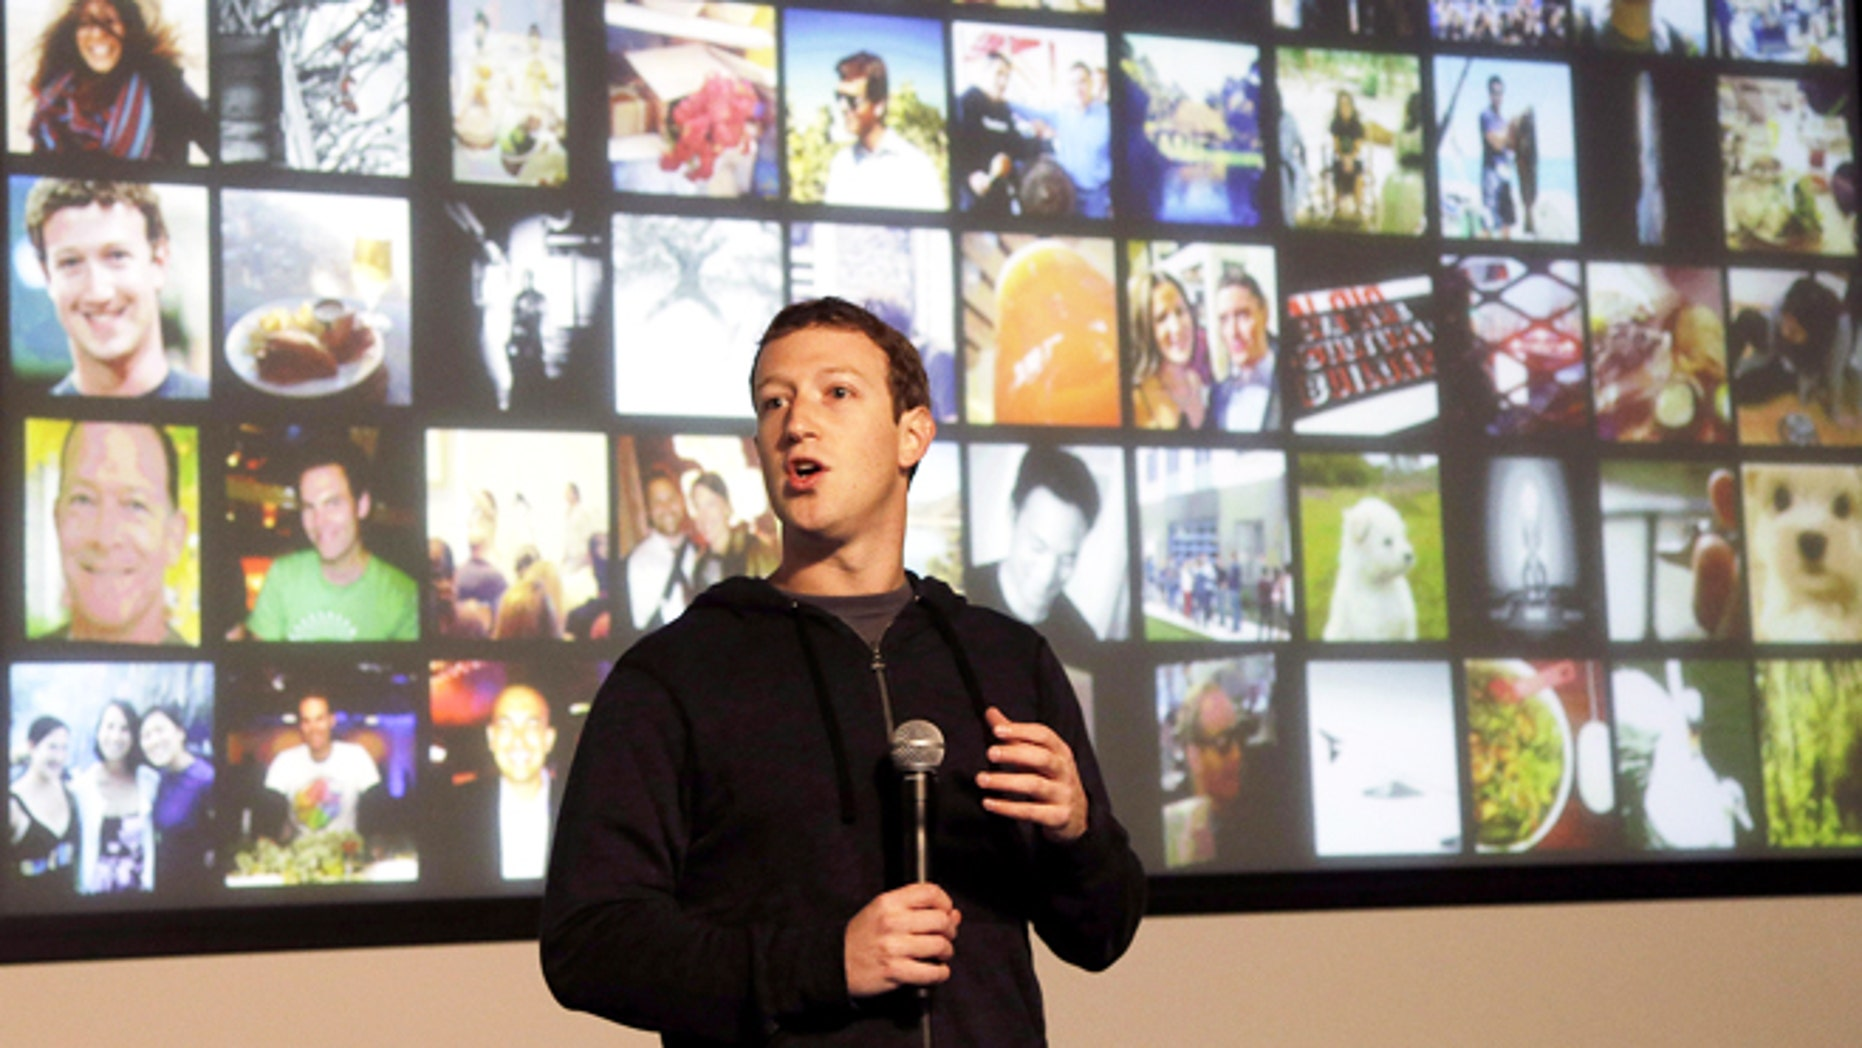 Jan. 15, 2013: Facebook CEO Mark Zuckerberg speaks at the company's headquarters in Menlo Park, Calif.